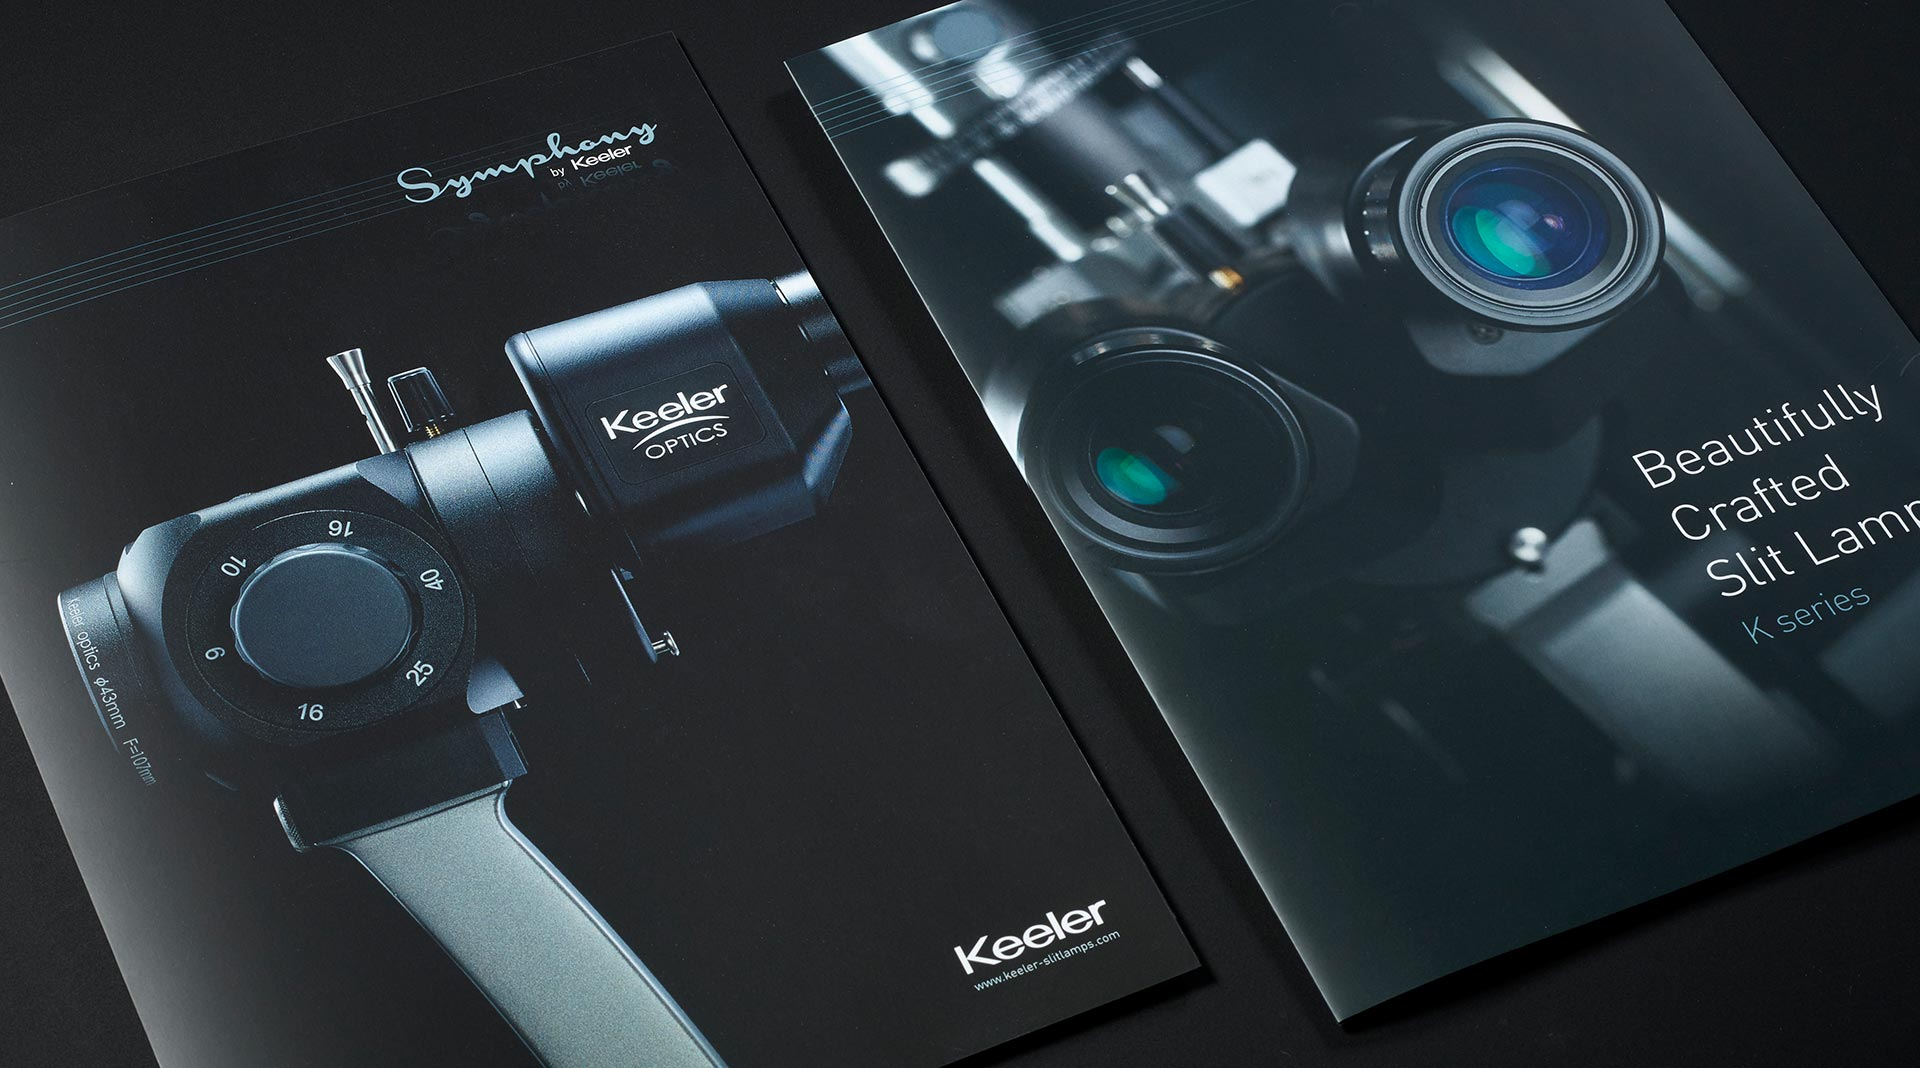 Keeler Symphony brochures